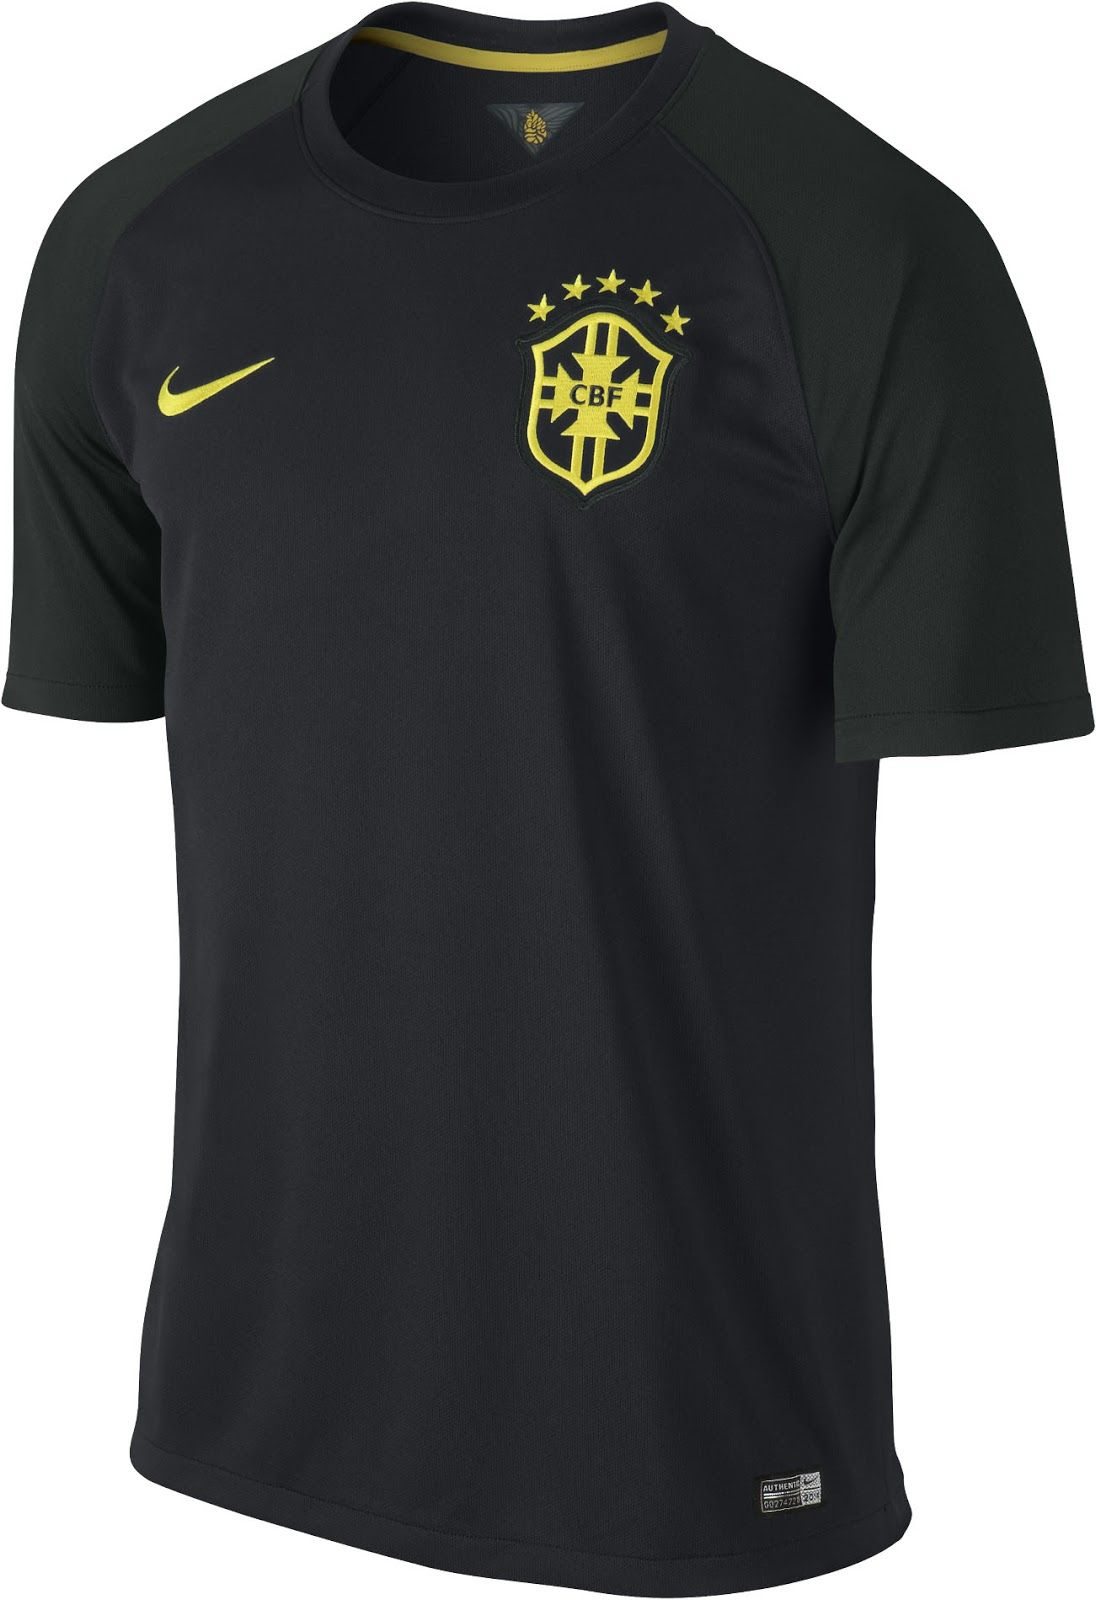 Brazil Third Kit for World Cup 2014  worldcup  brazil2014  brazil  soccer   football  BRA 6bfd7462c56